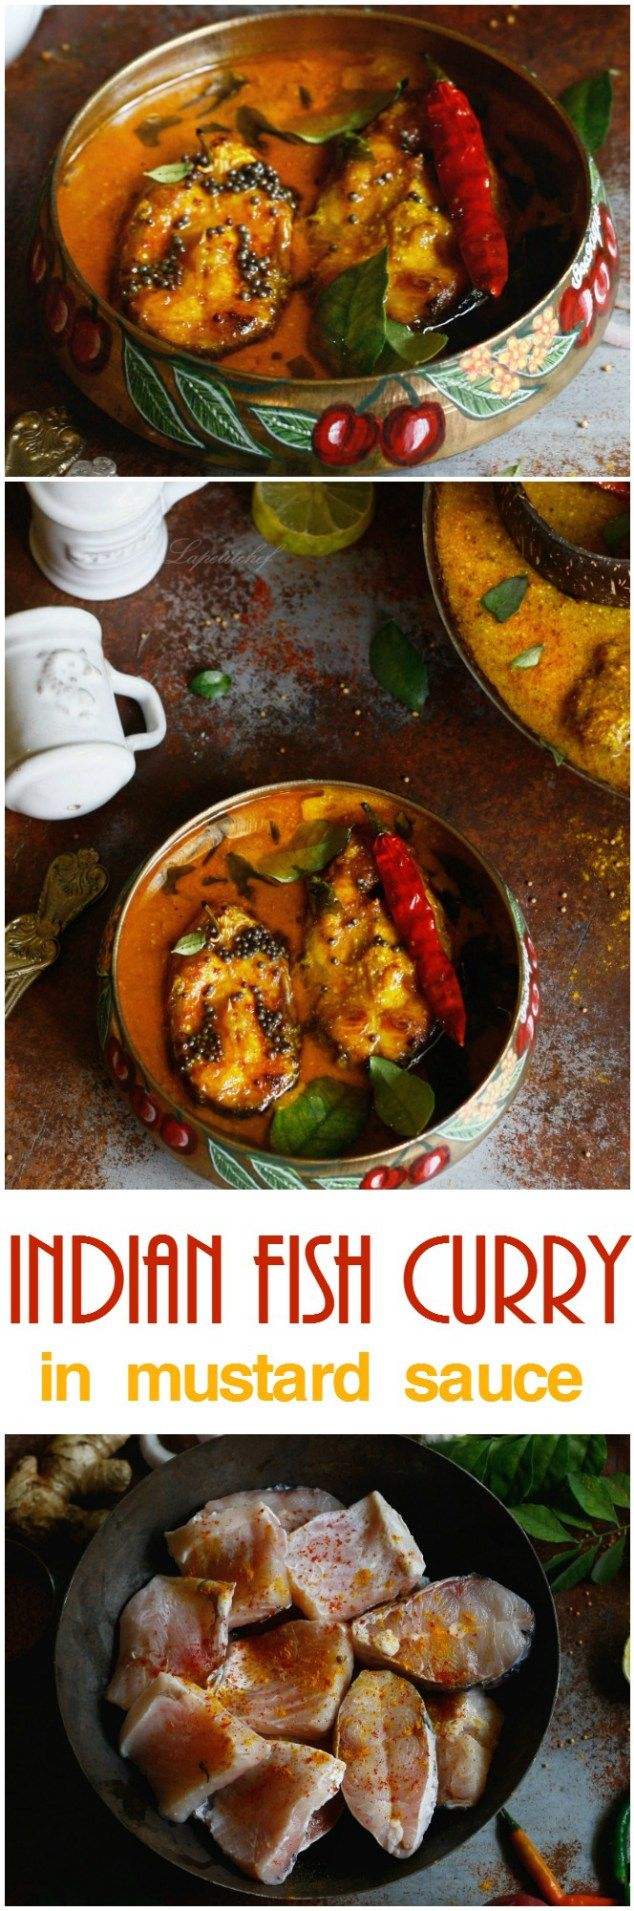 Yum Indian fish curry in  light mustard sauce recipe, Indian Food recipes via Super Yum Malabar Chicken Curry Recipe @ @cookingcurries Indian Food, Kerala Food Recipes via @sunjayjk